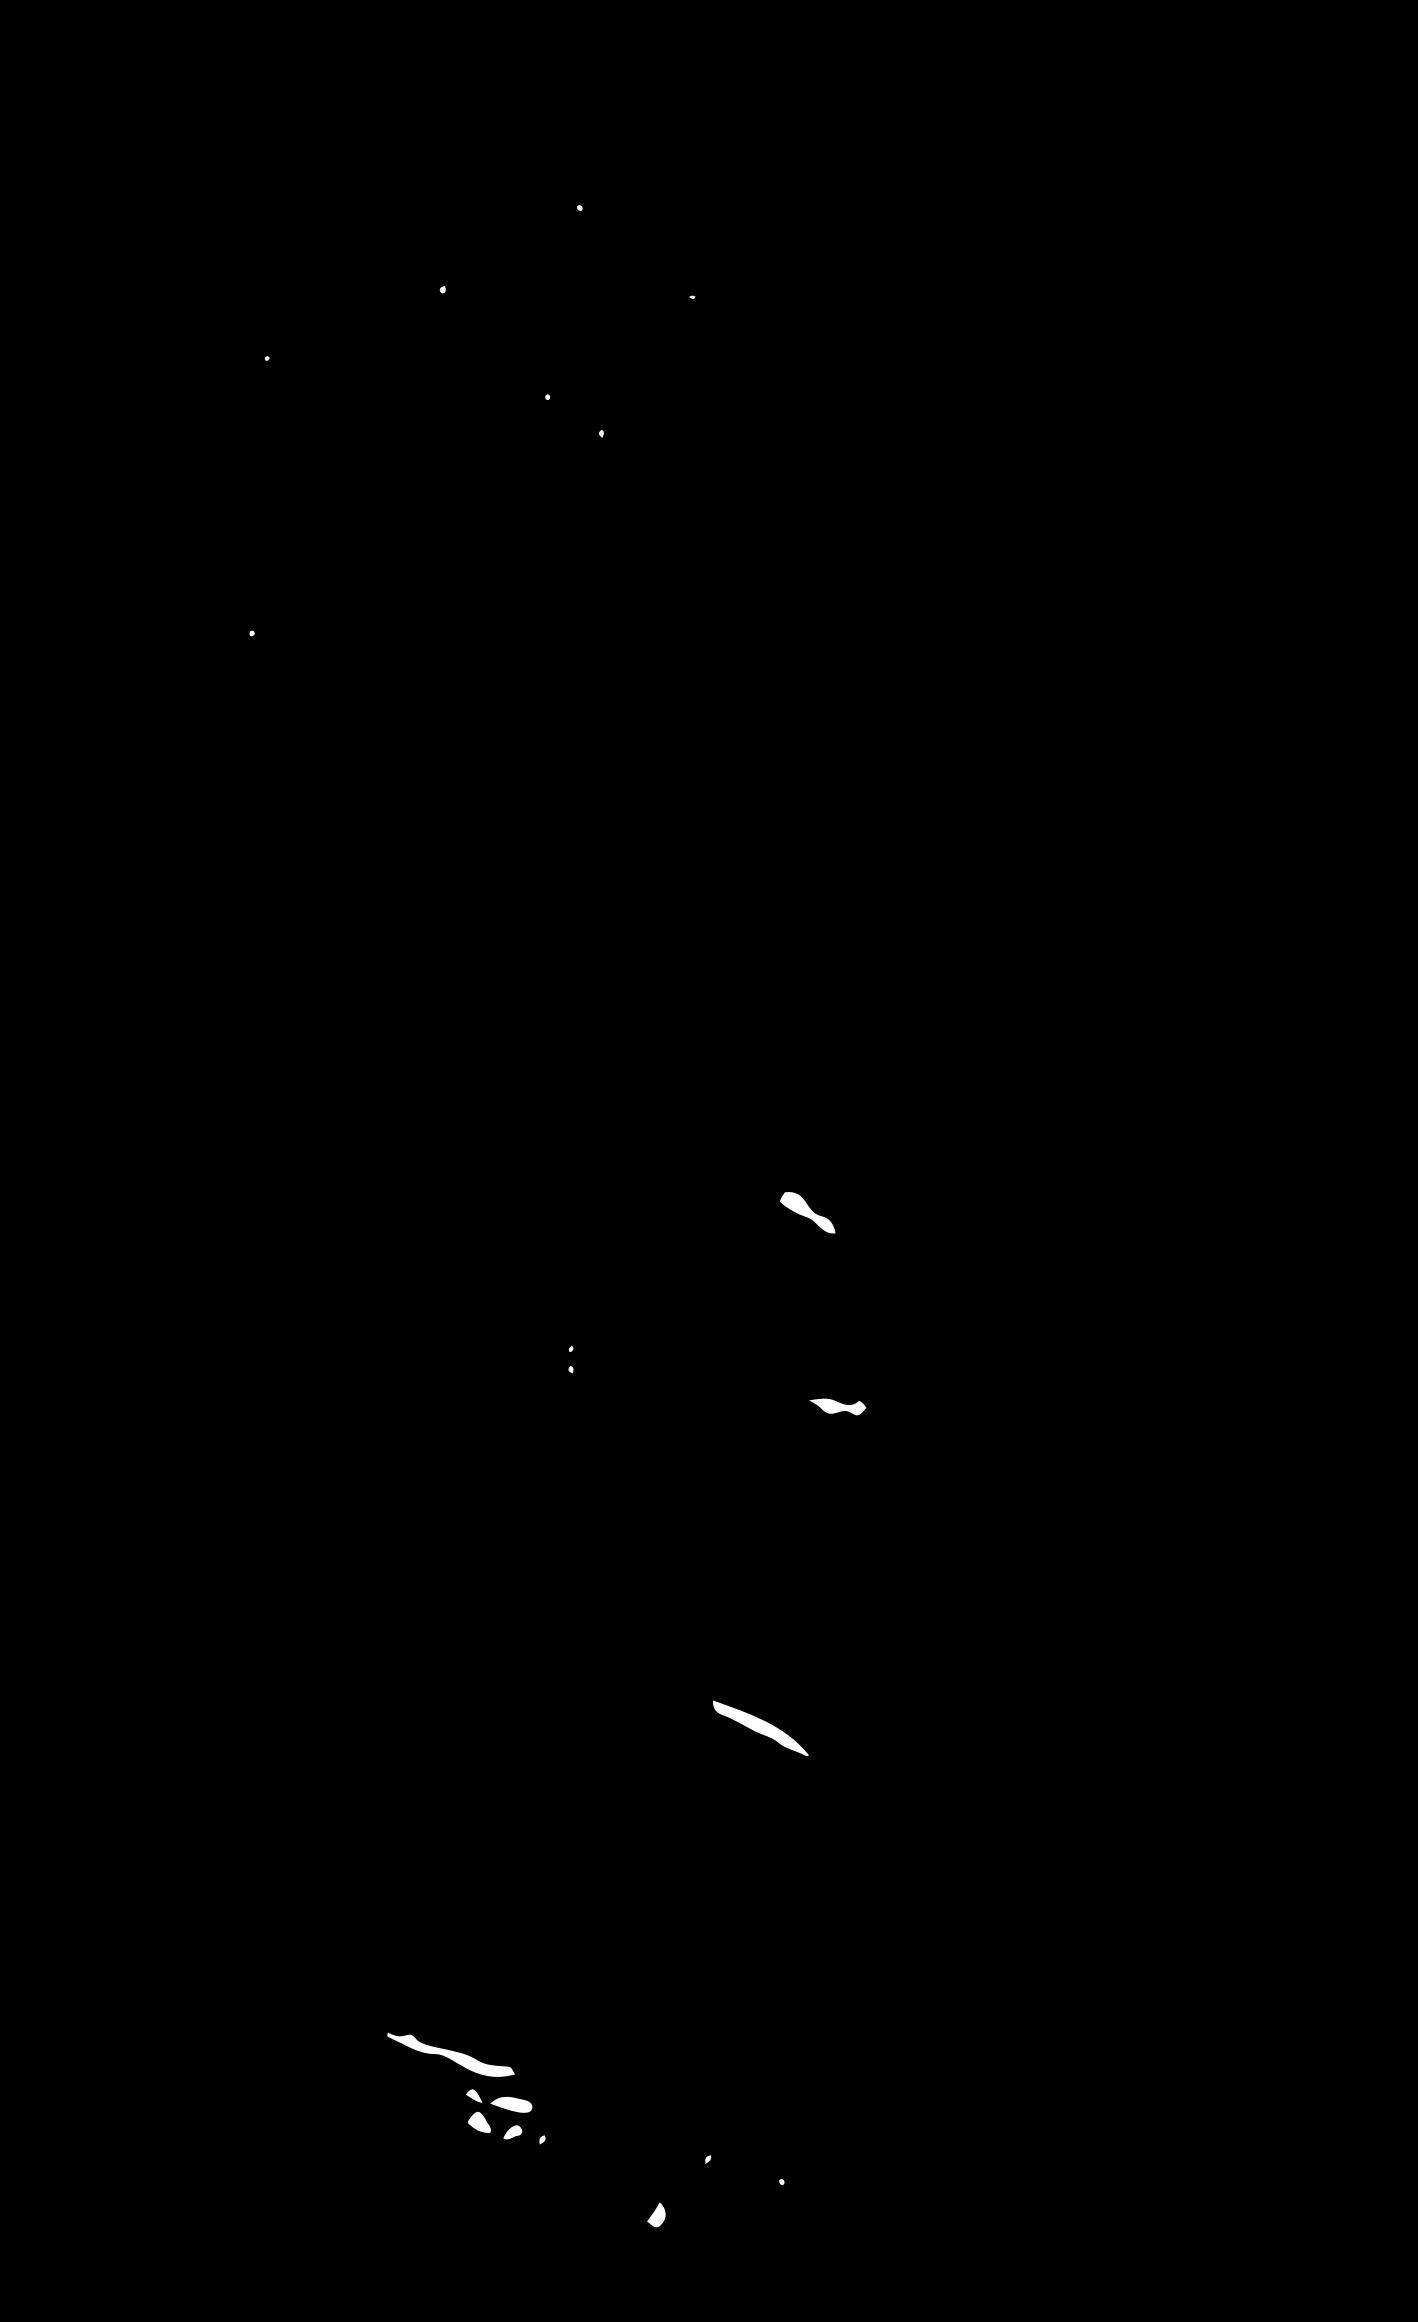 Fingerprint Vector Clipart image.